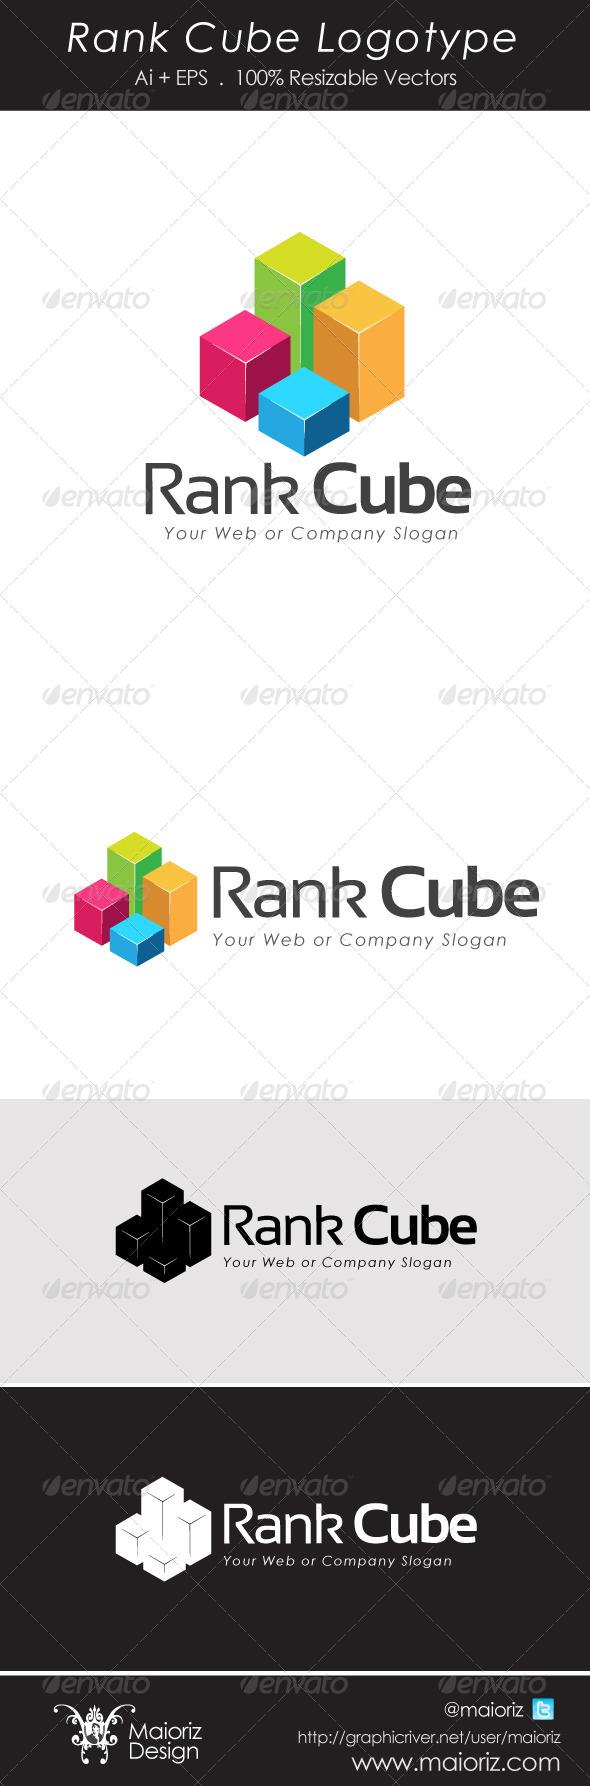 GraphicRiver Rank Cube Logotype 4540281